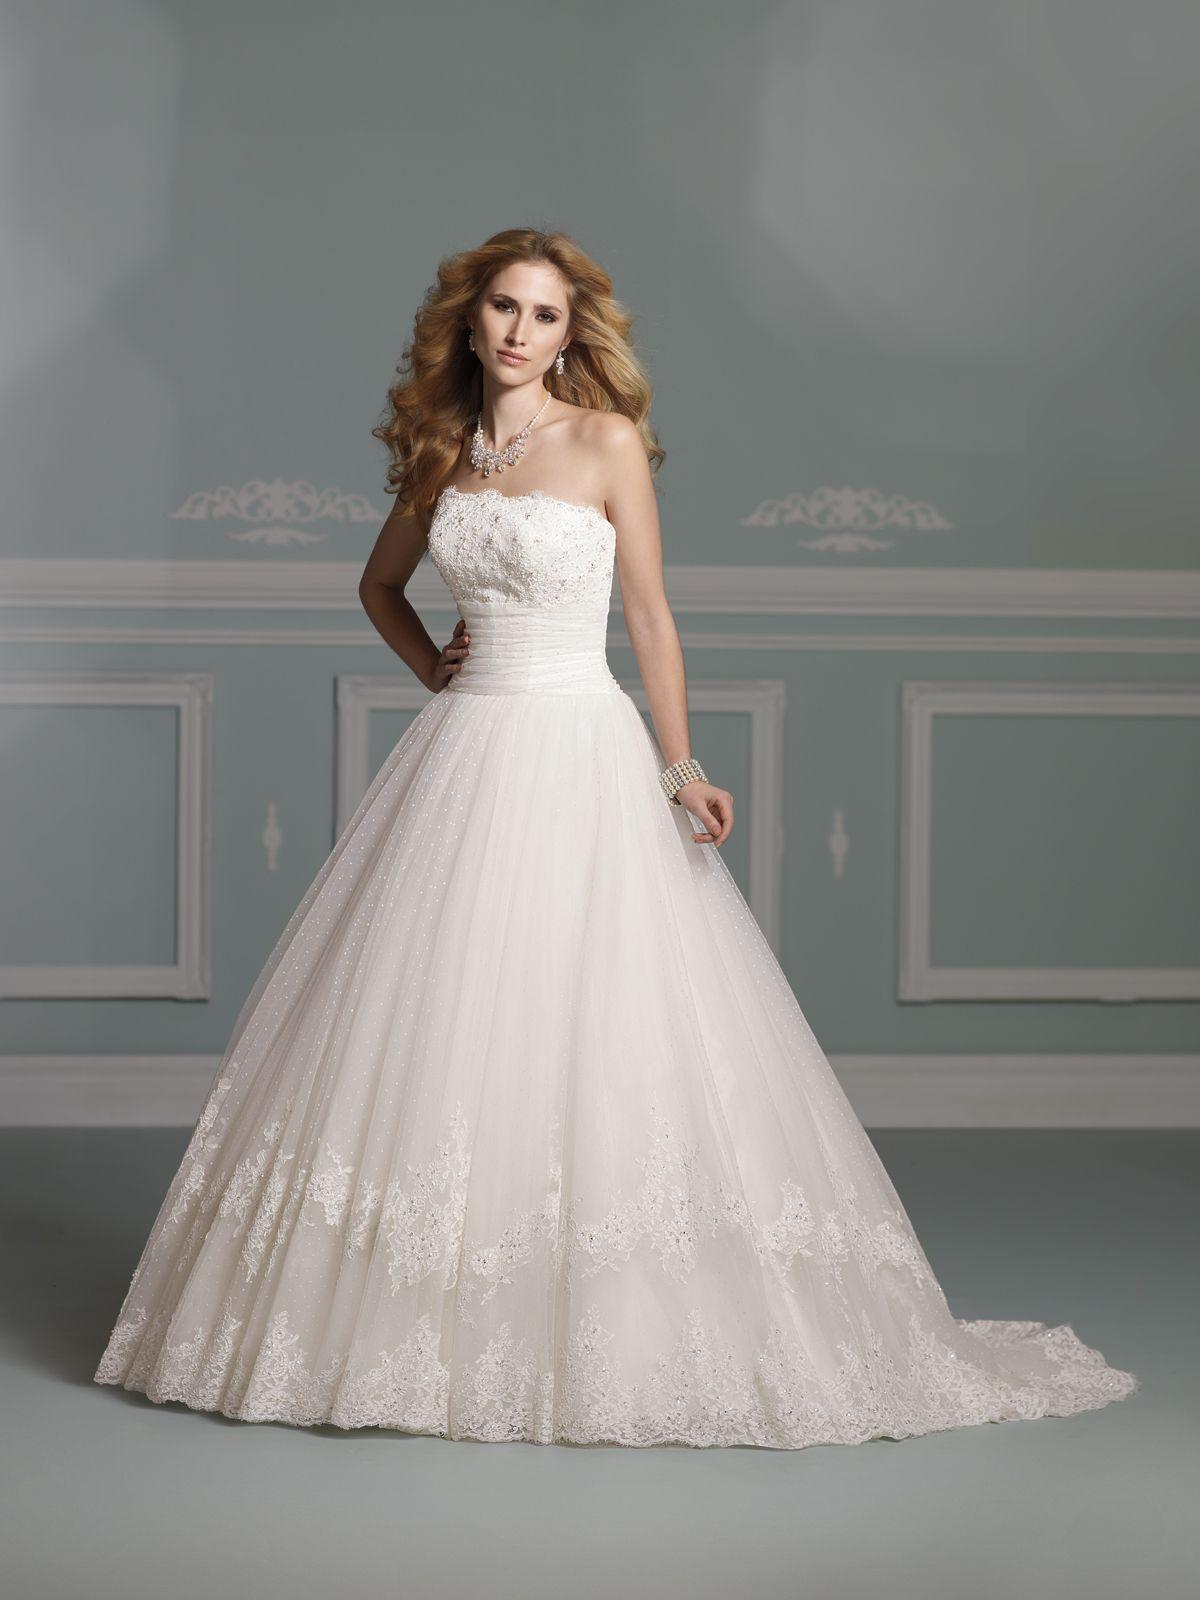 James clifford designer wedding dresses style j wedding